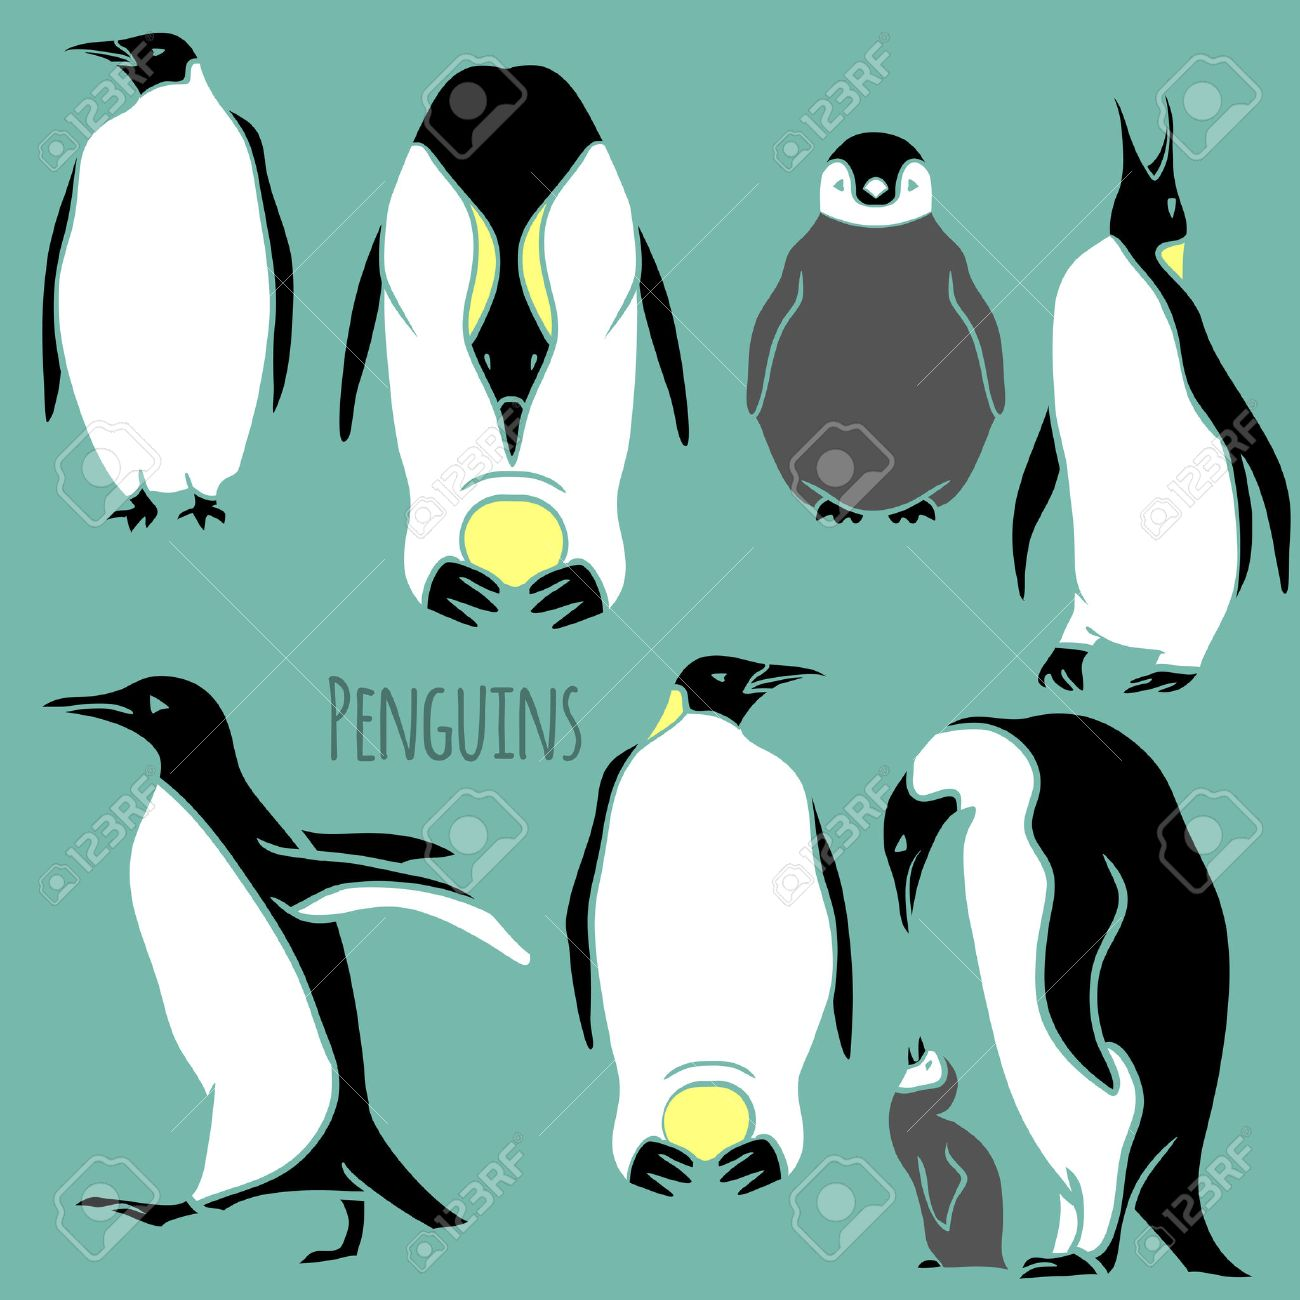 snow penguin vector